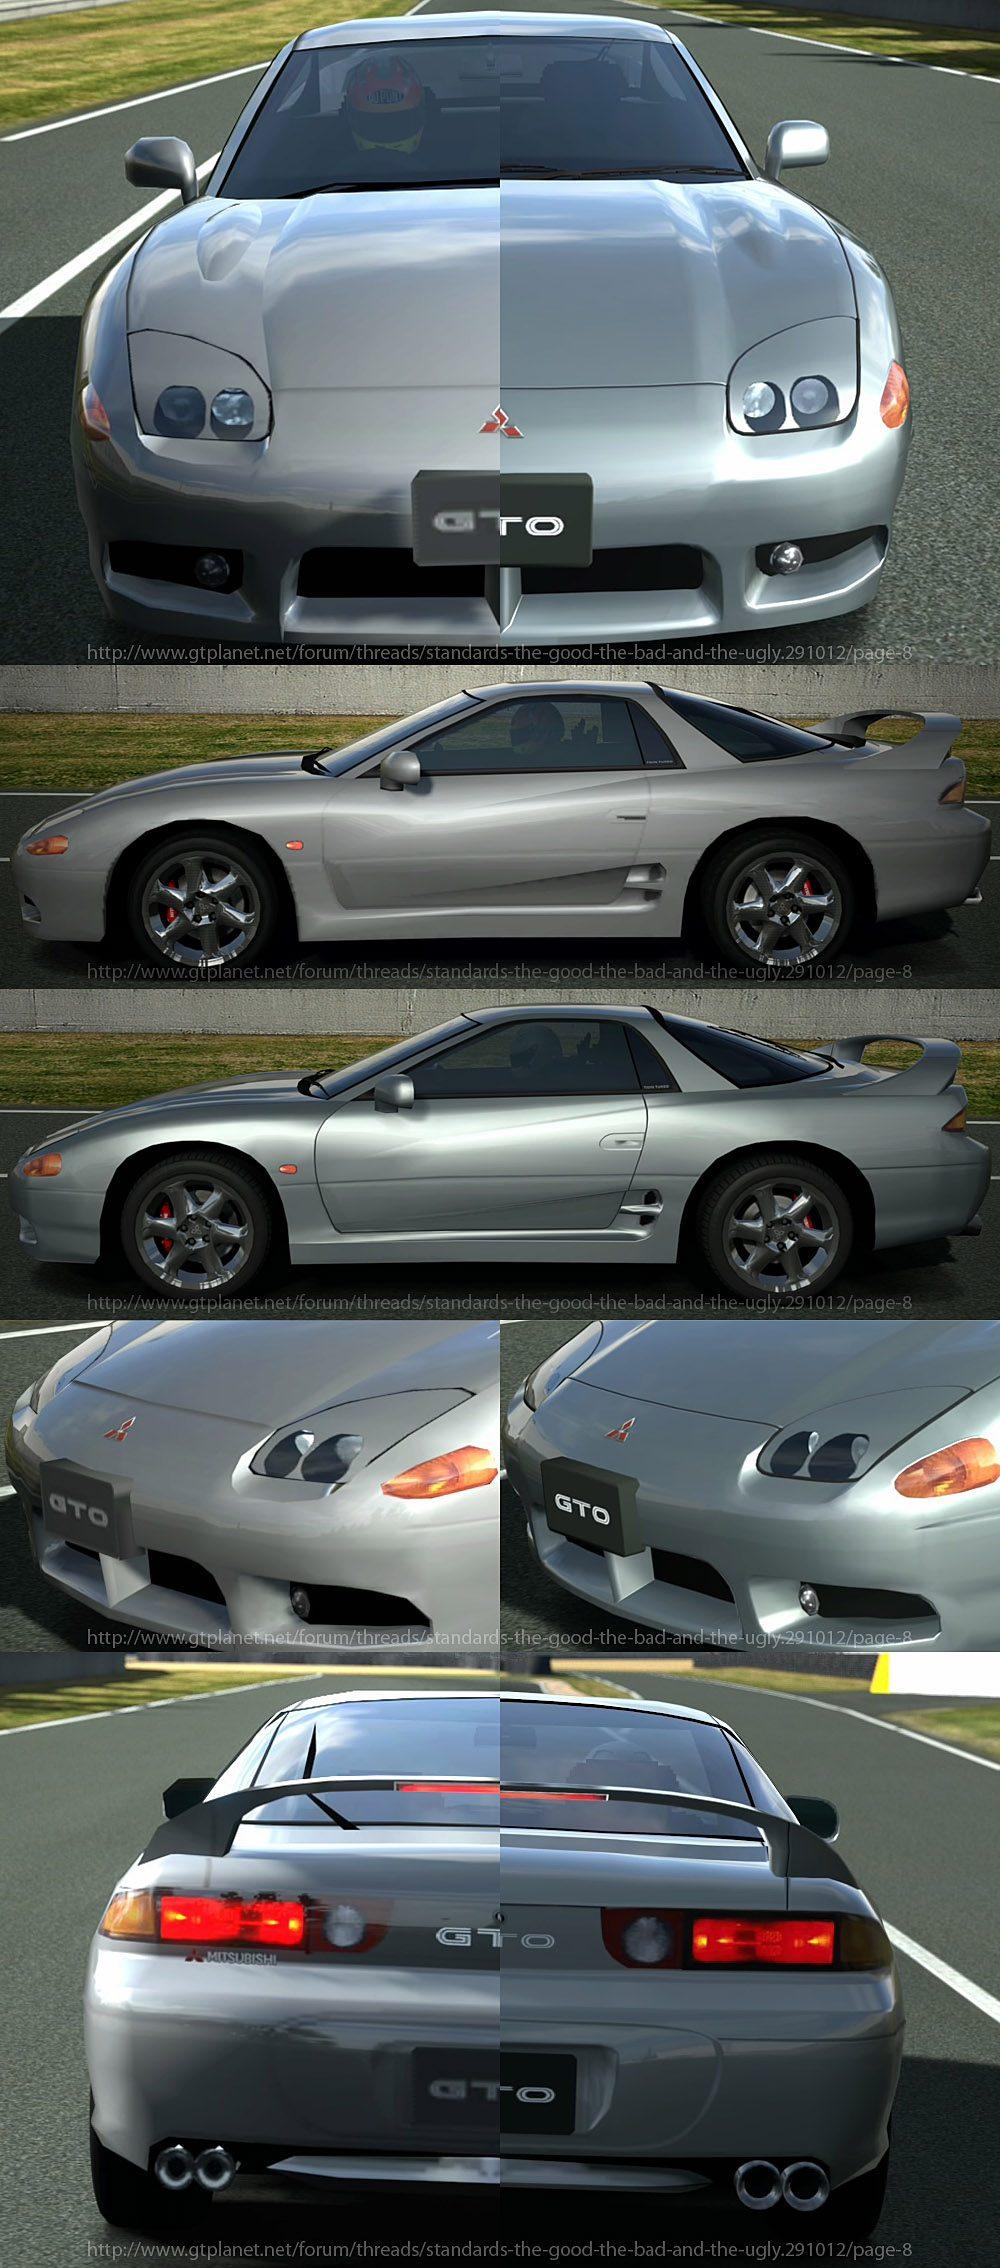 GTO-96_041.jpg